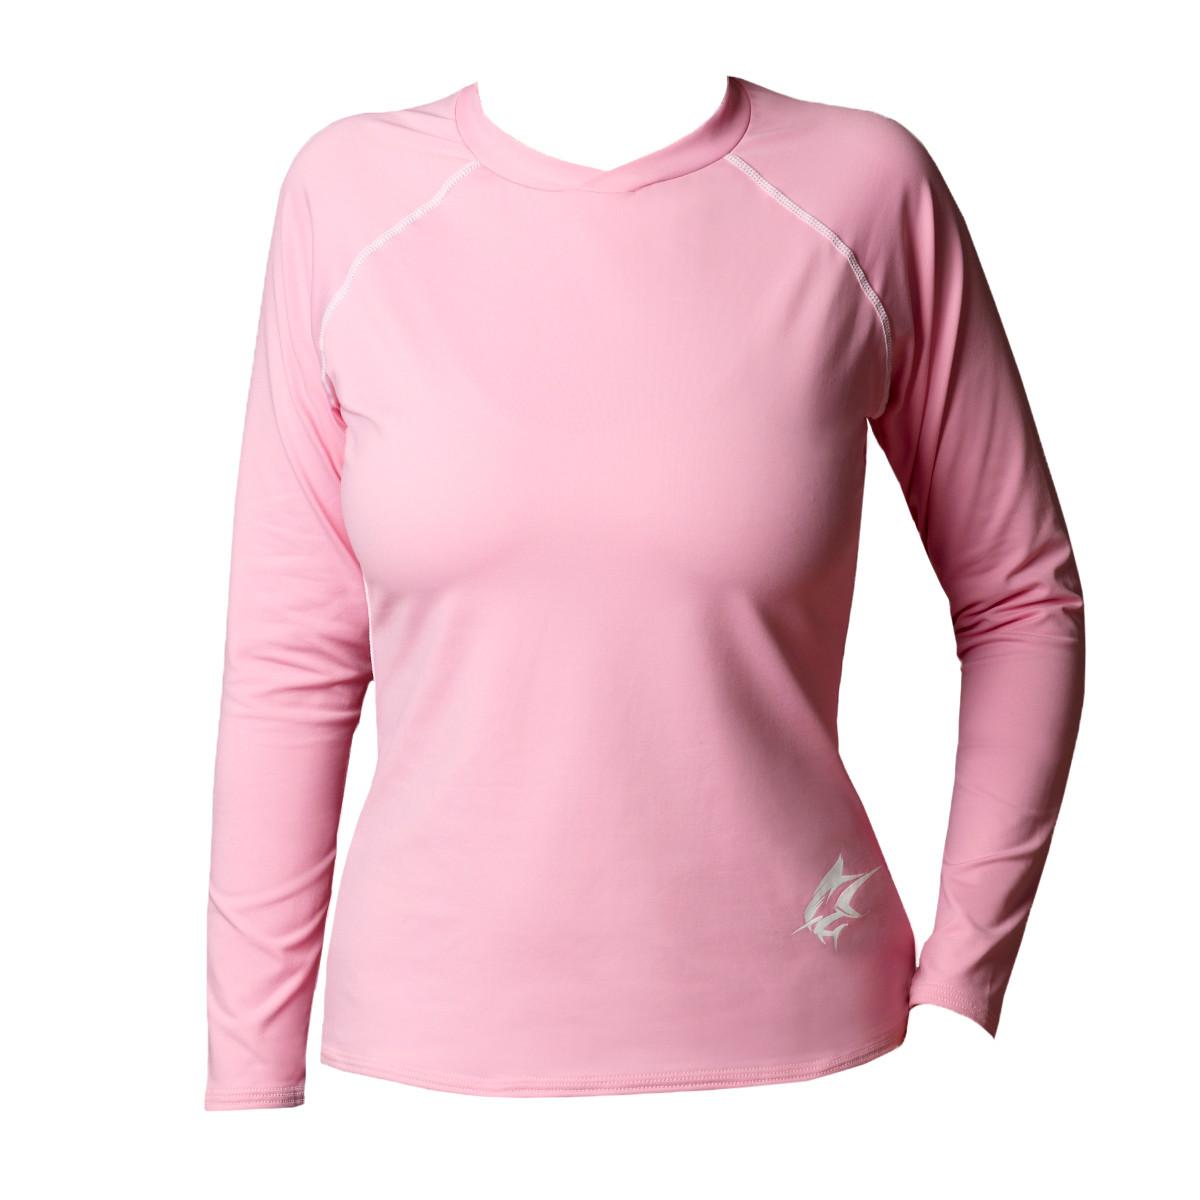 Ocean Rider Sun Protective Clothing Women's Performance UPF 50 Shirt